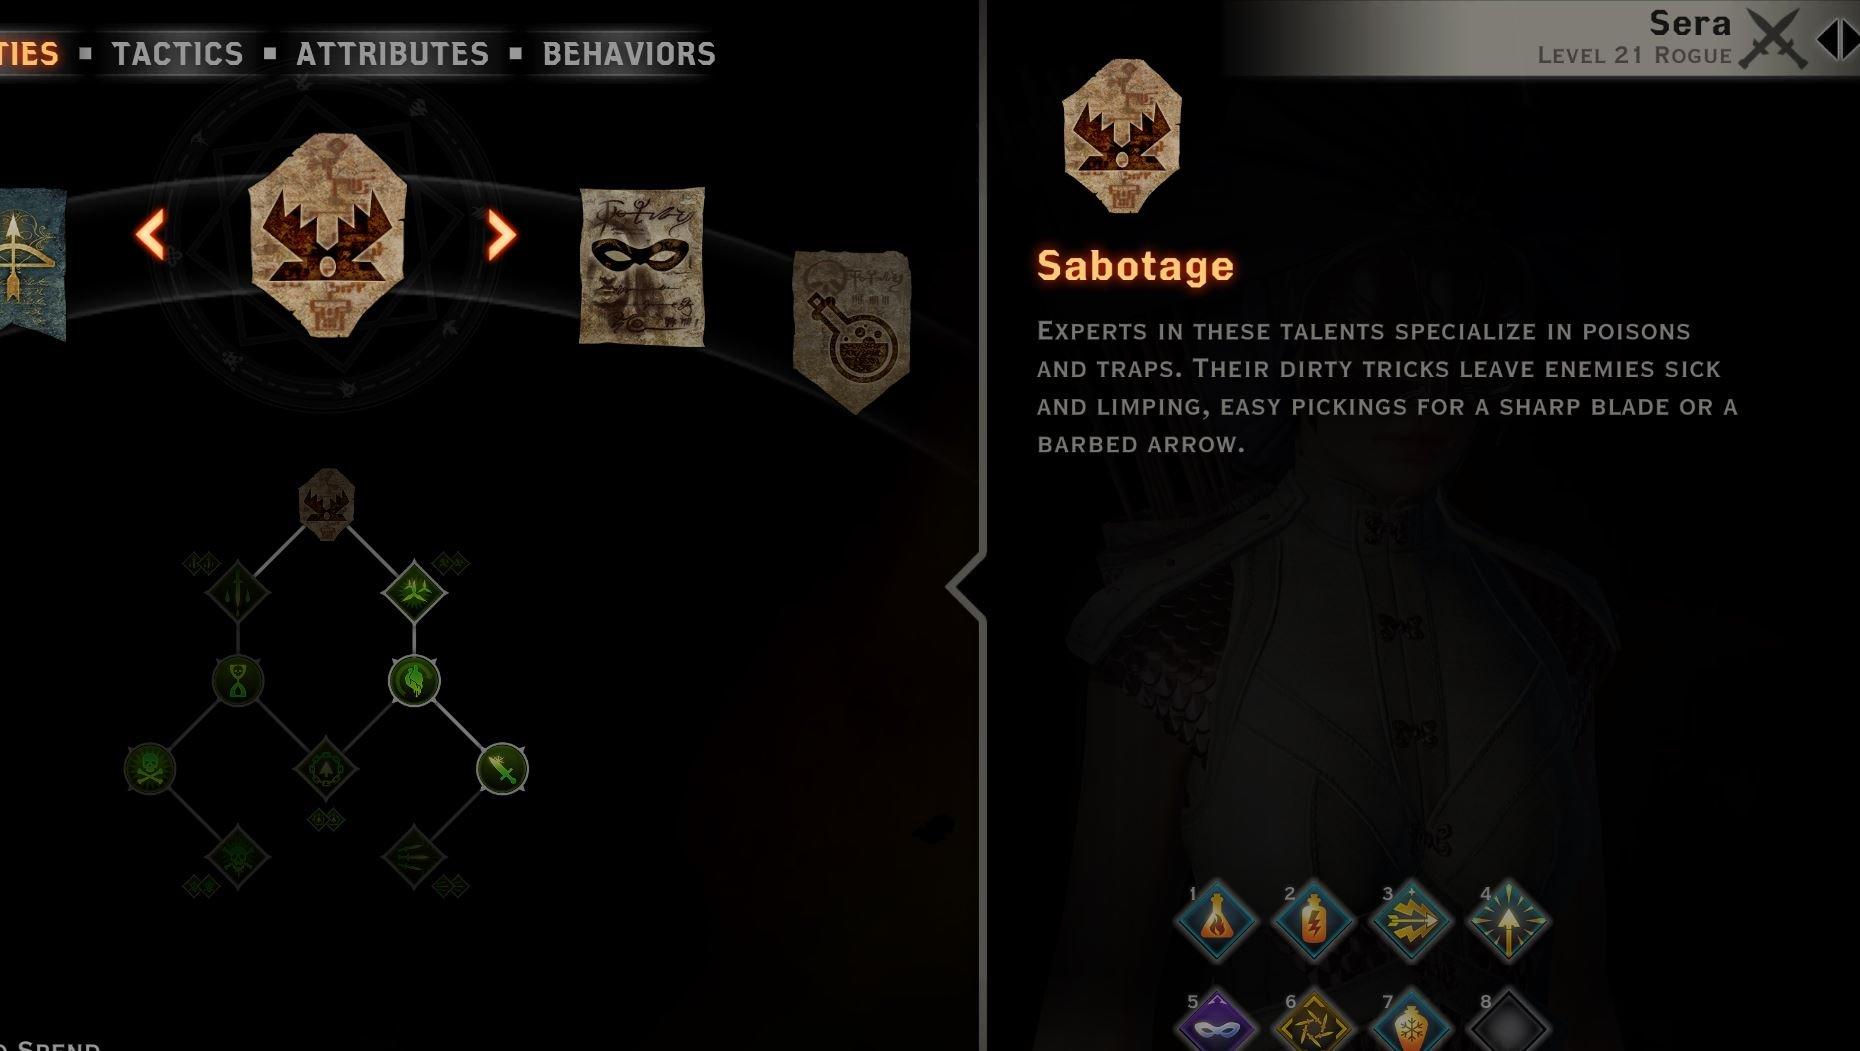 Sabotage tree sera